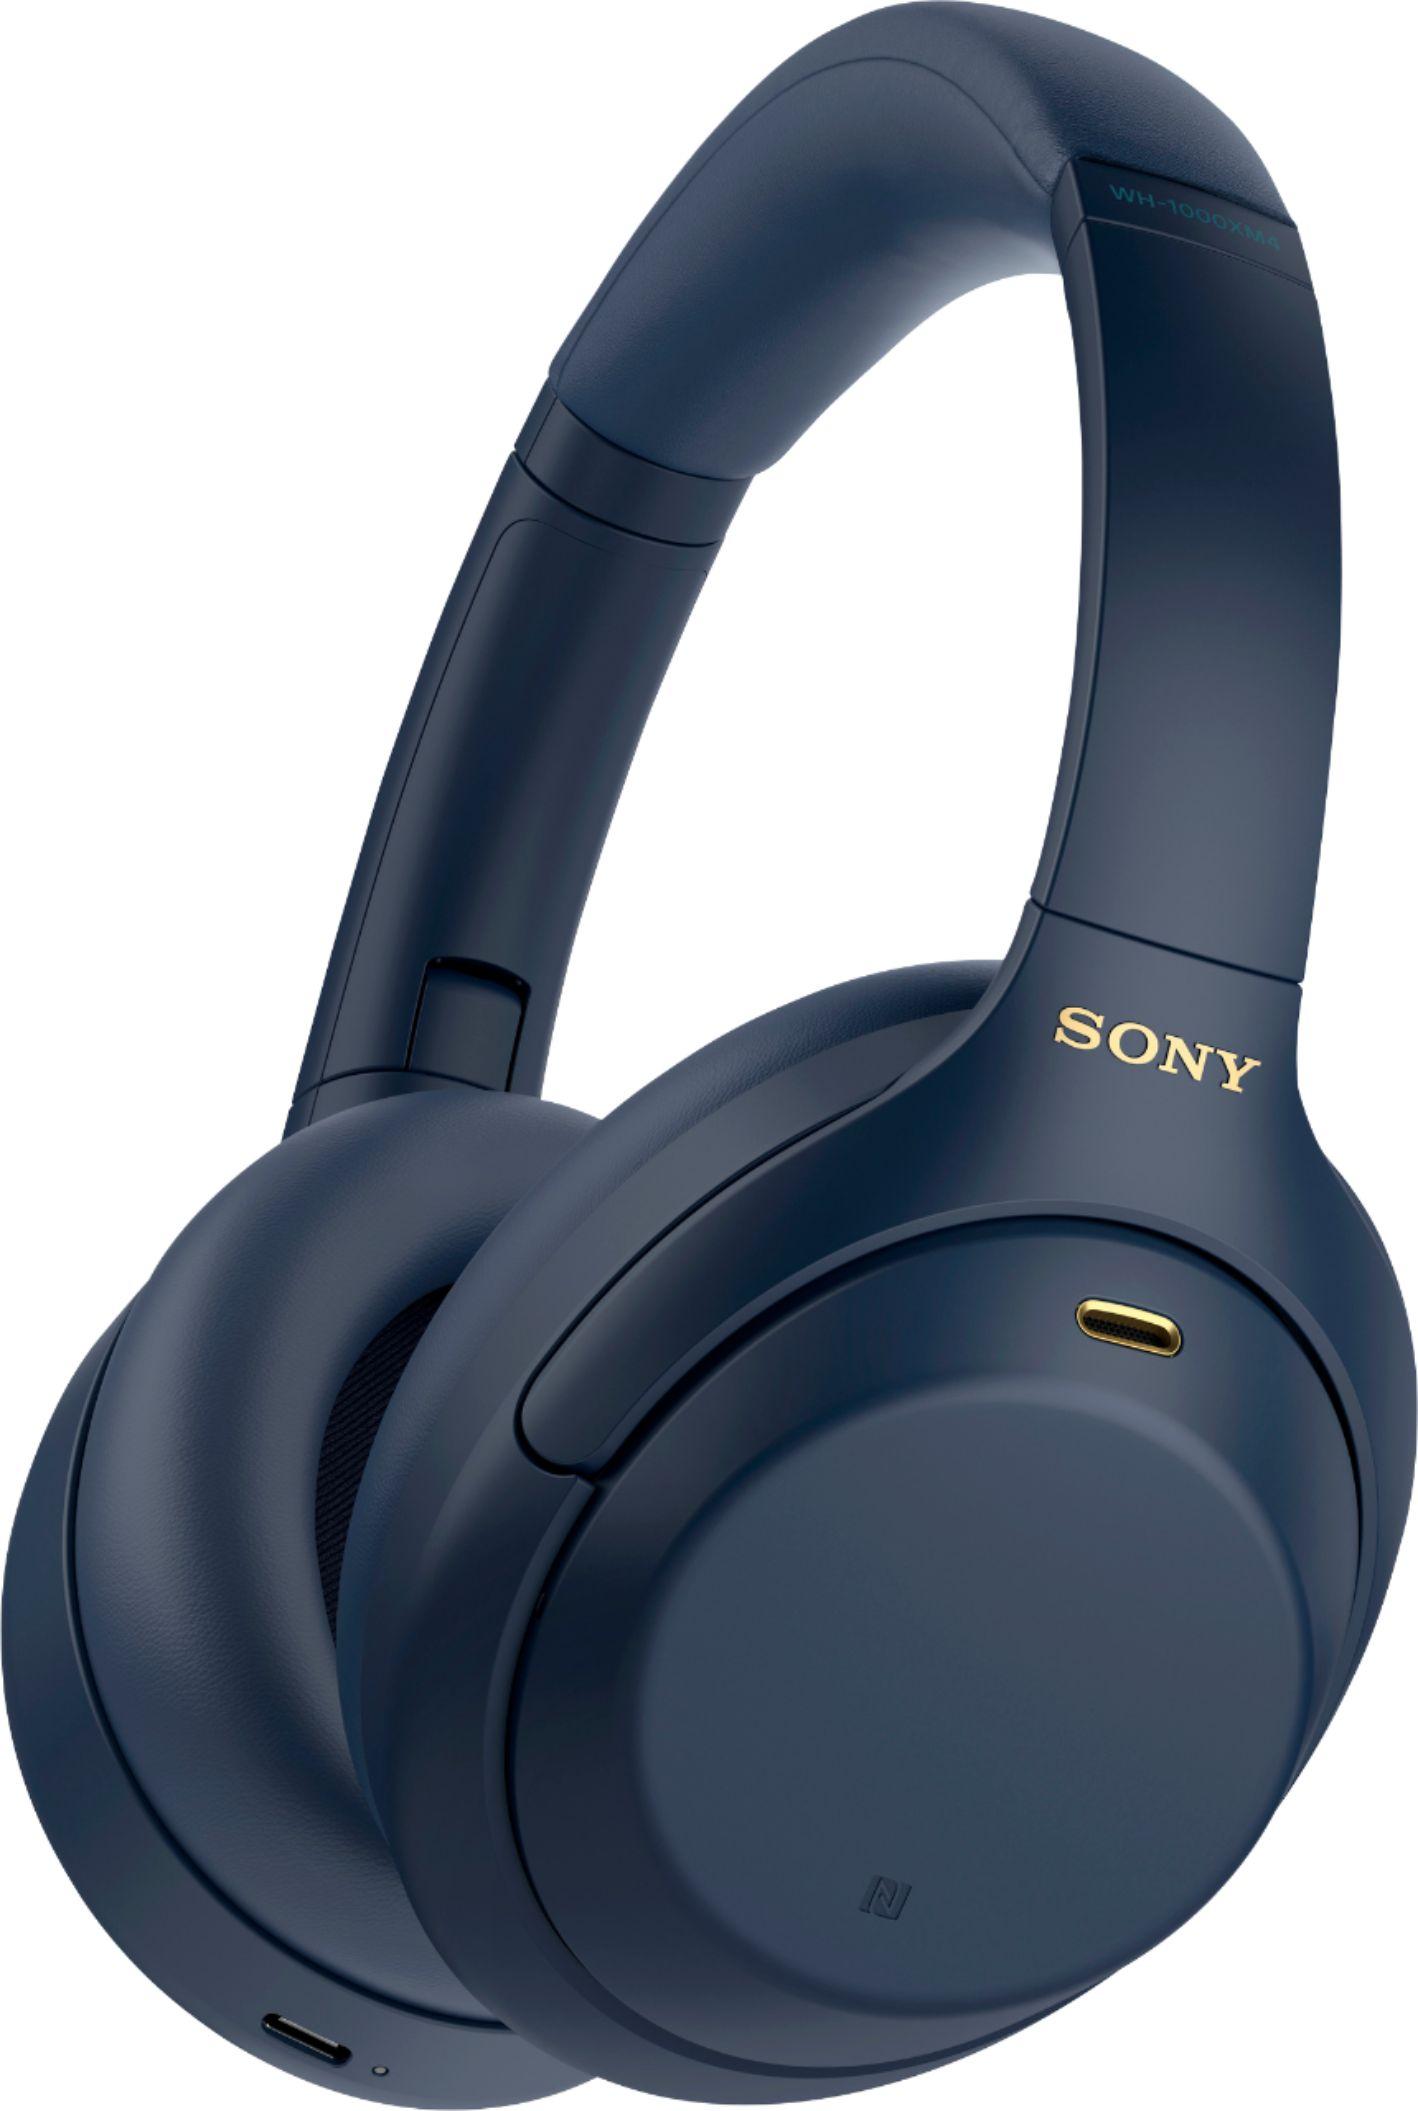 Sony 1000XM4 Refurbished with 2 year All State warranty